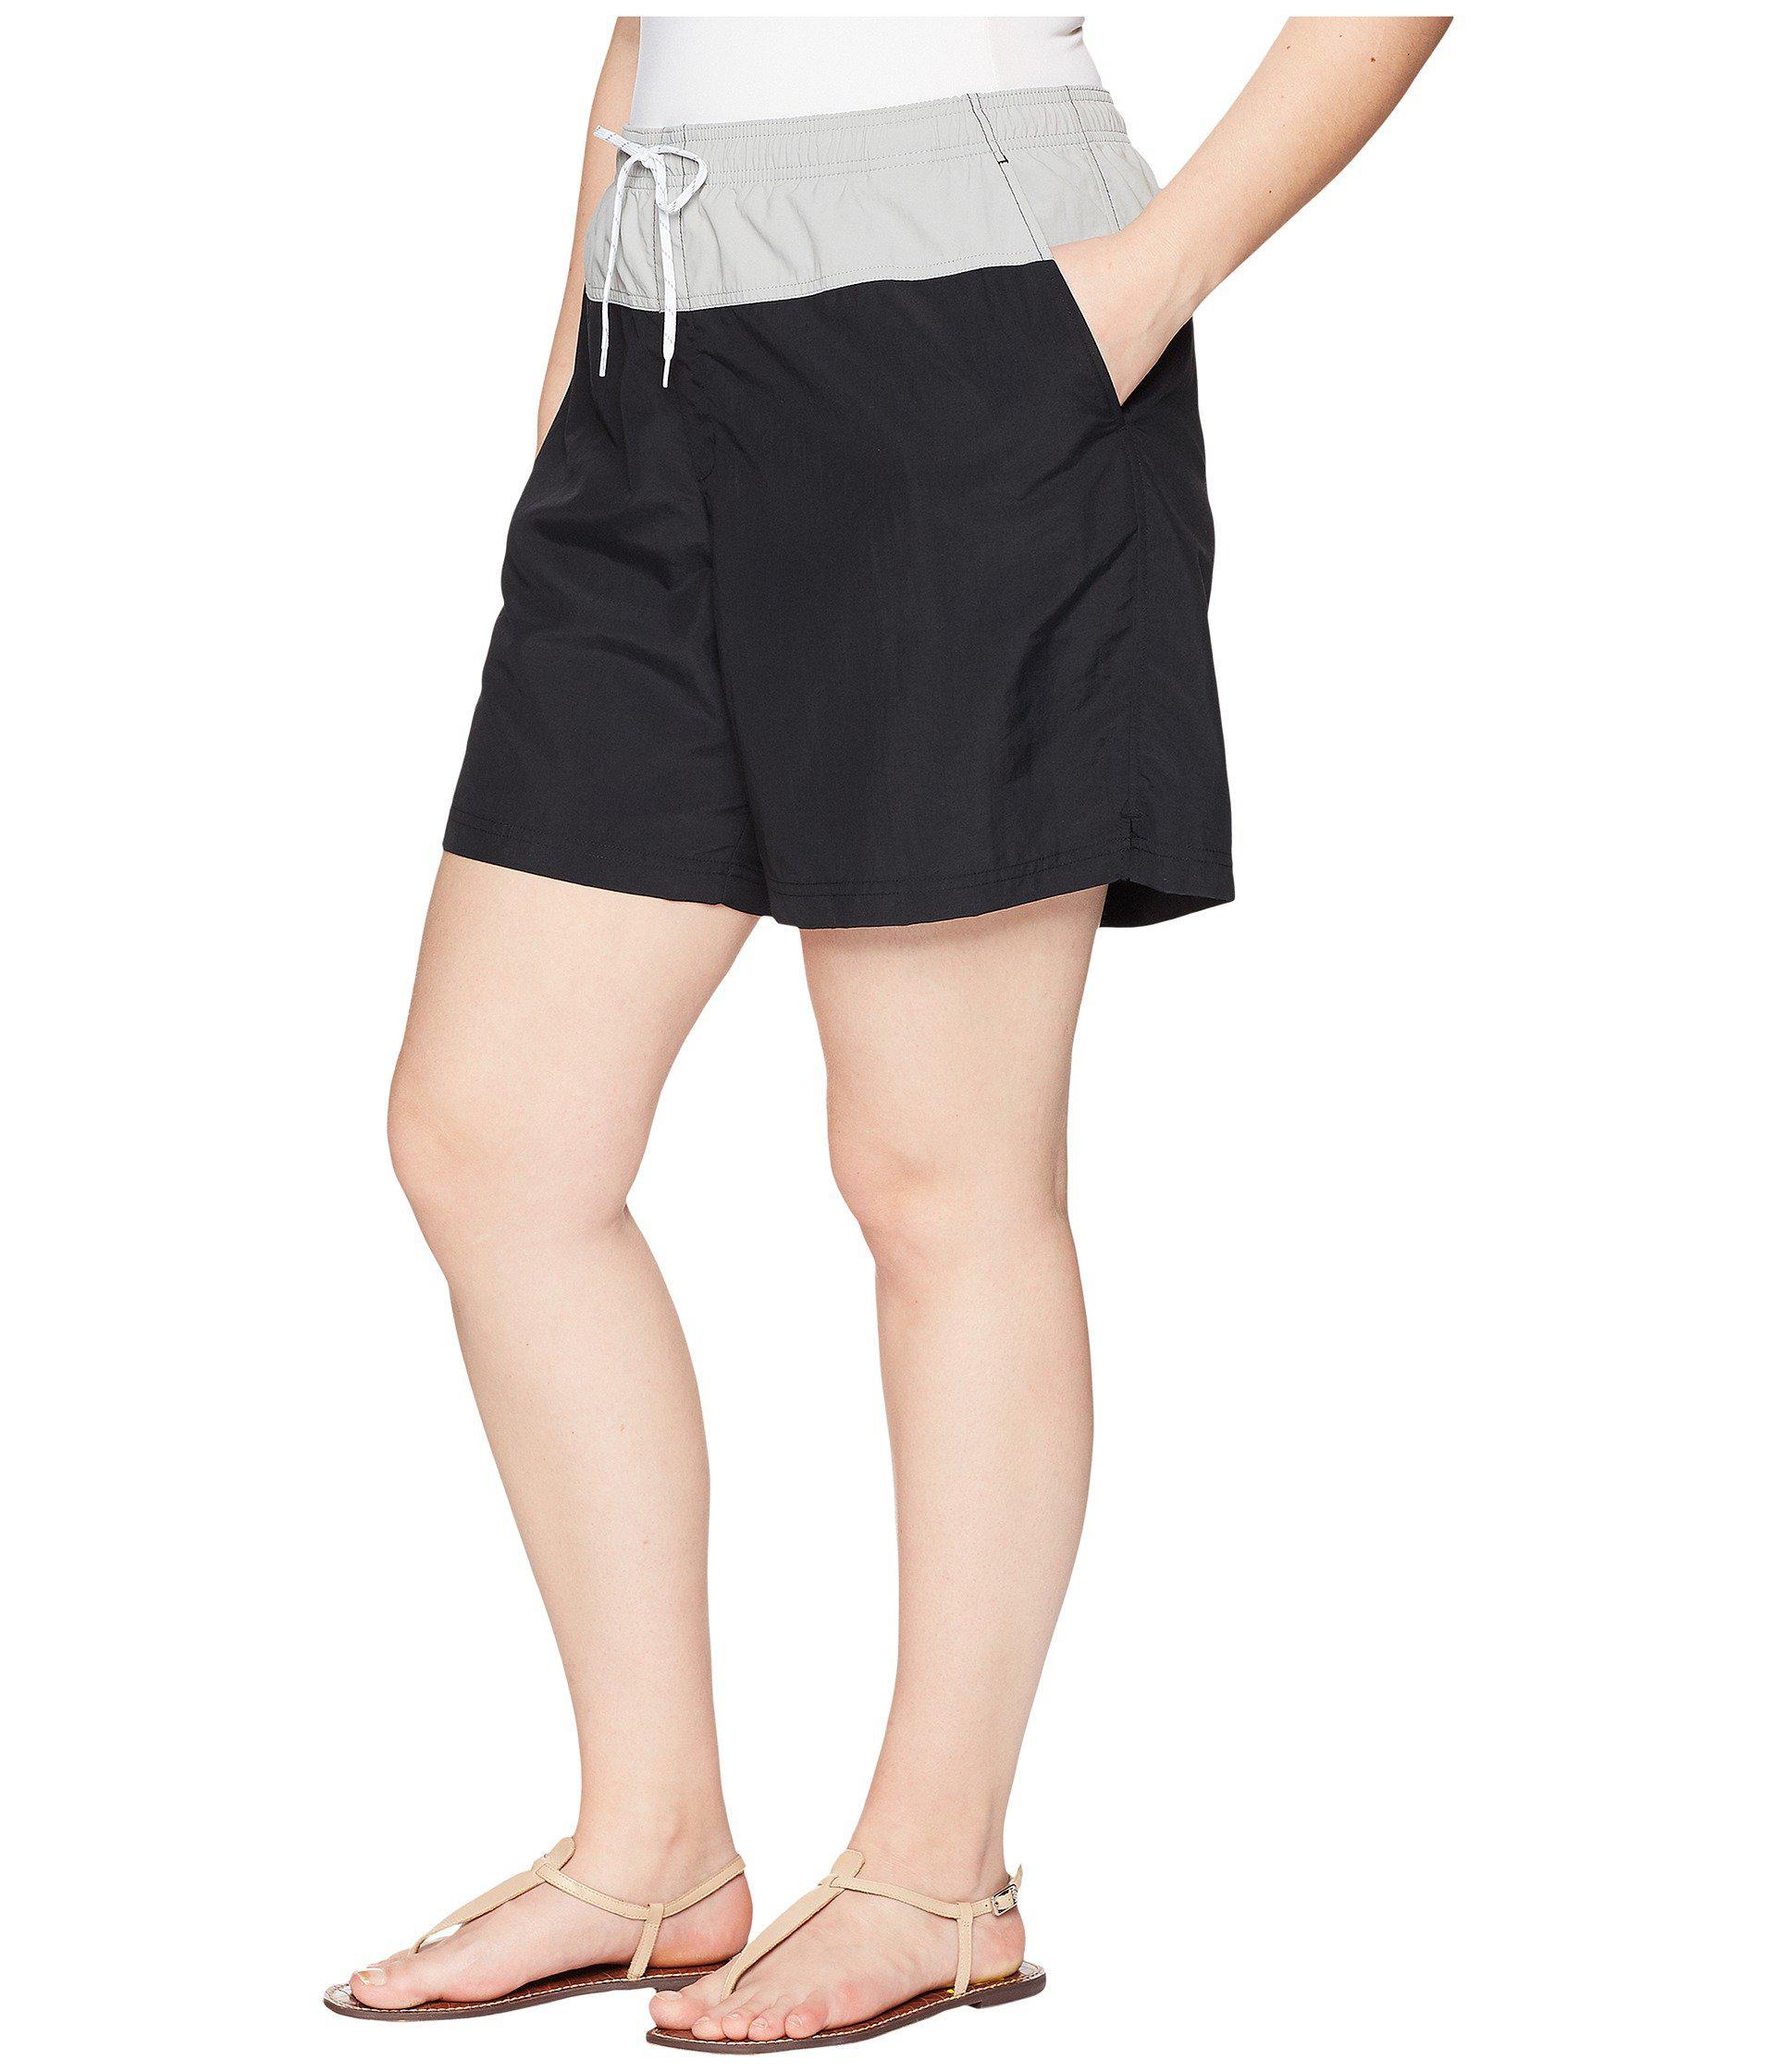 303341b68c Lyst - Columbia Plus Size Sandy Rivertm Color Blocked Shorts in Black